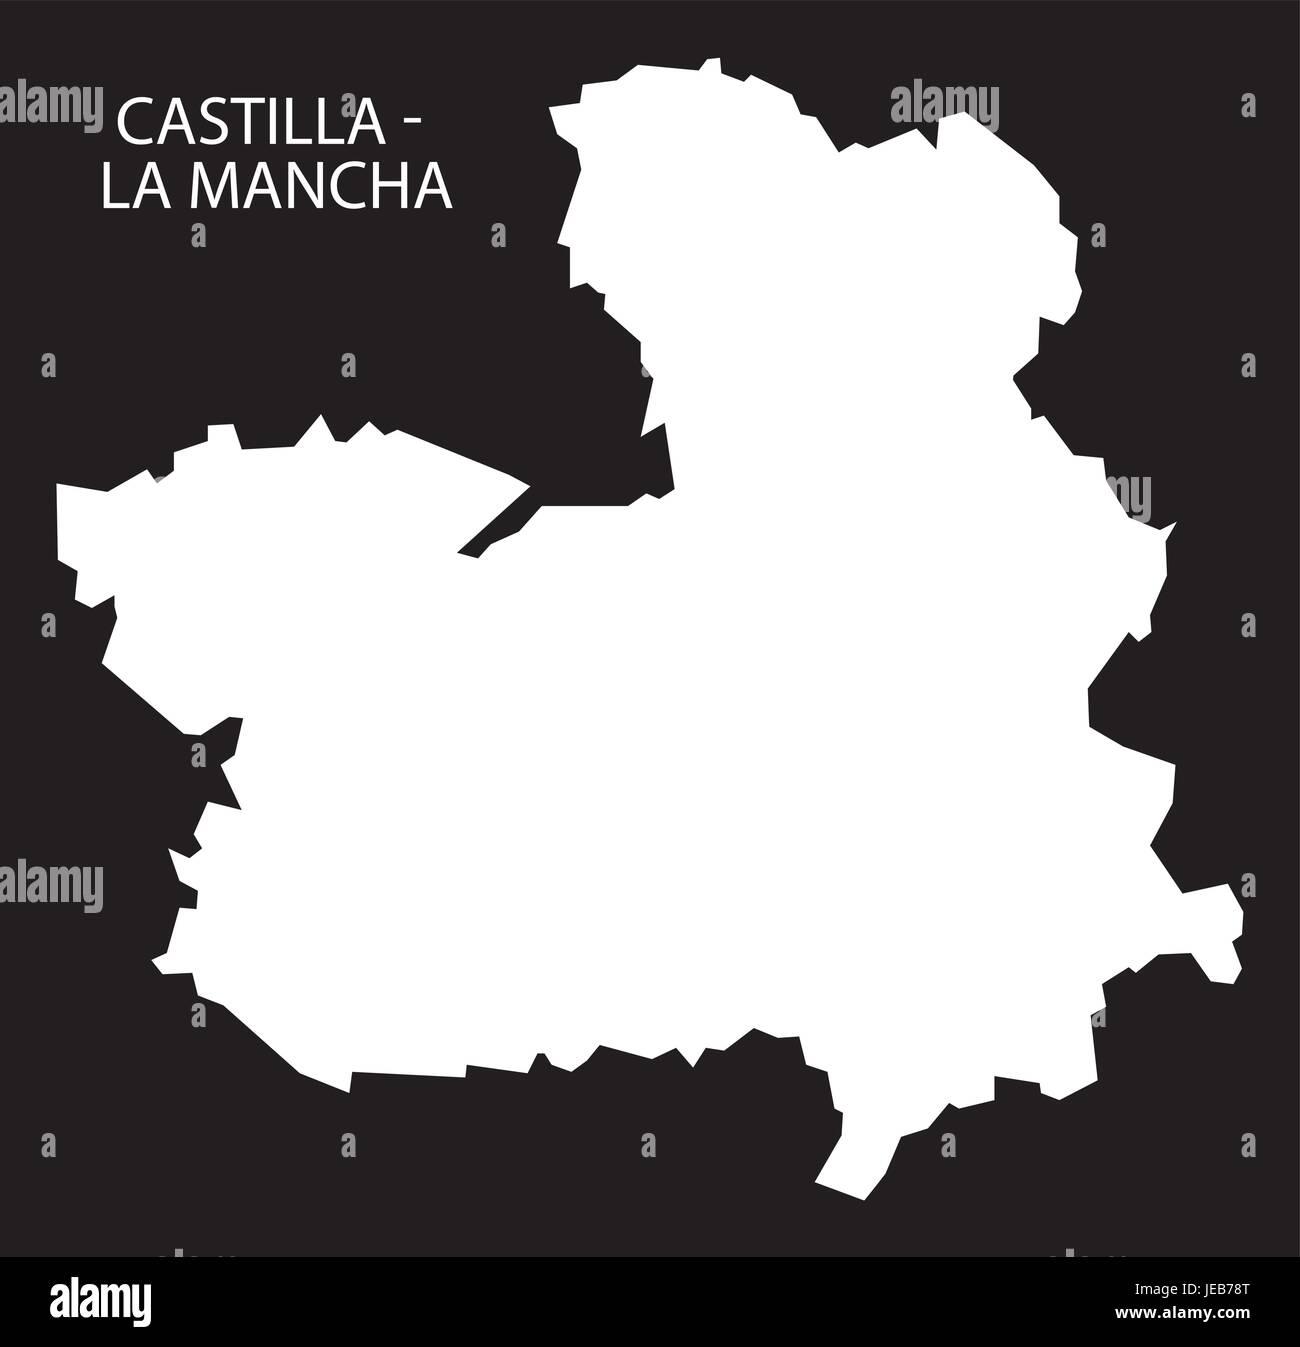 La Mancha Spain Map.Castilla La Mancha Spain Map Black Inverted Silhouette